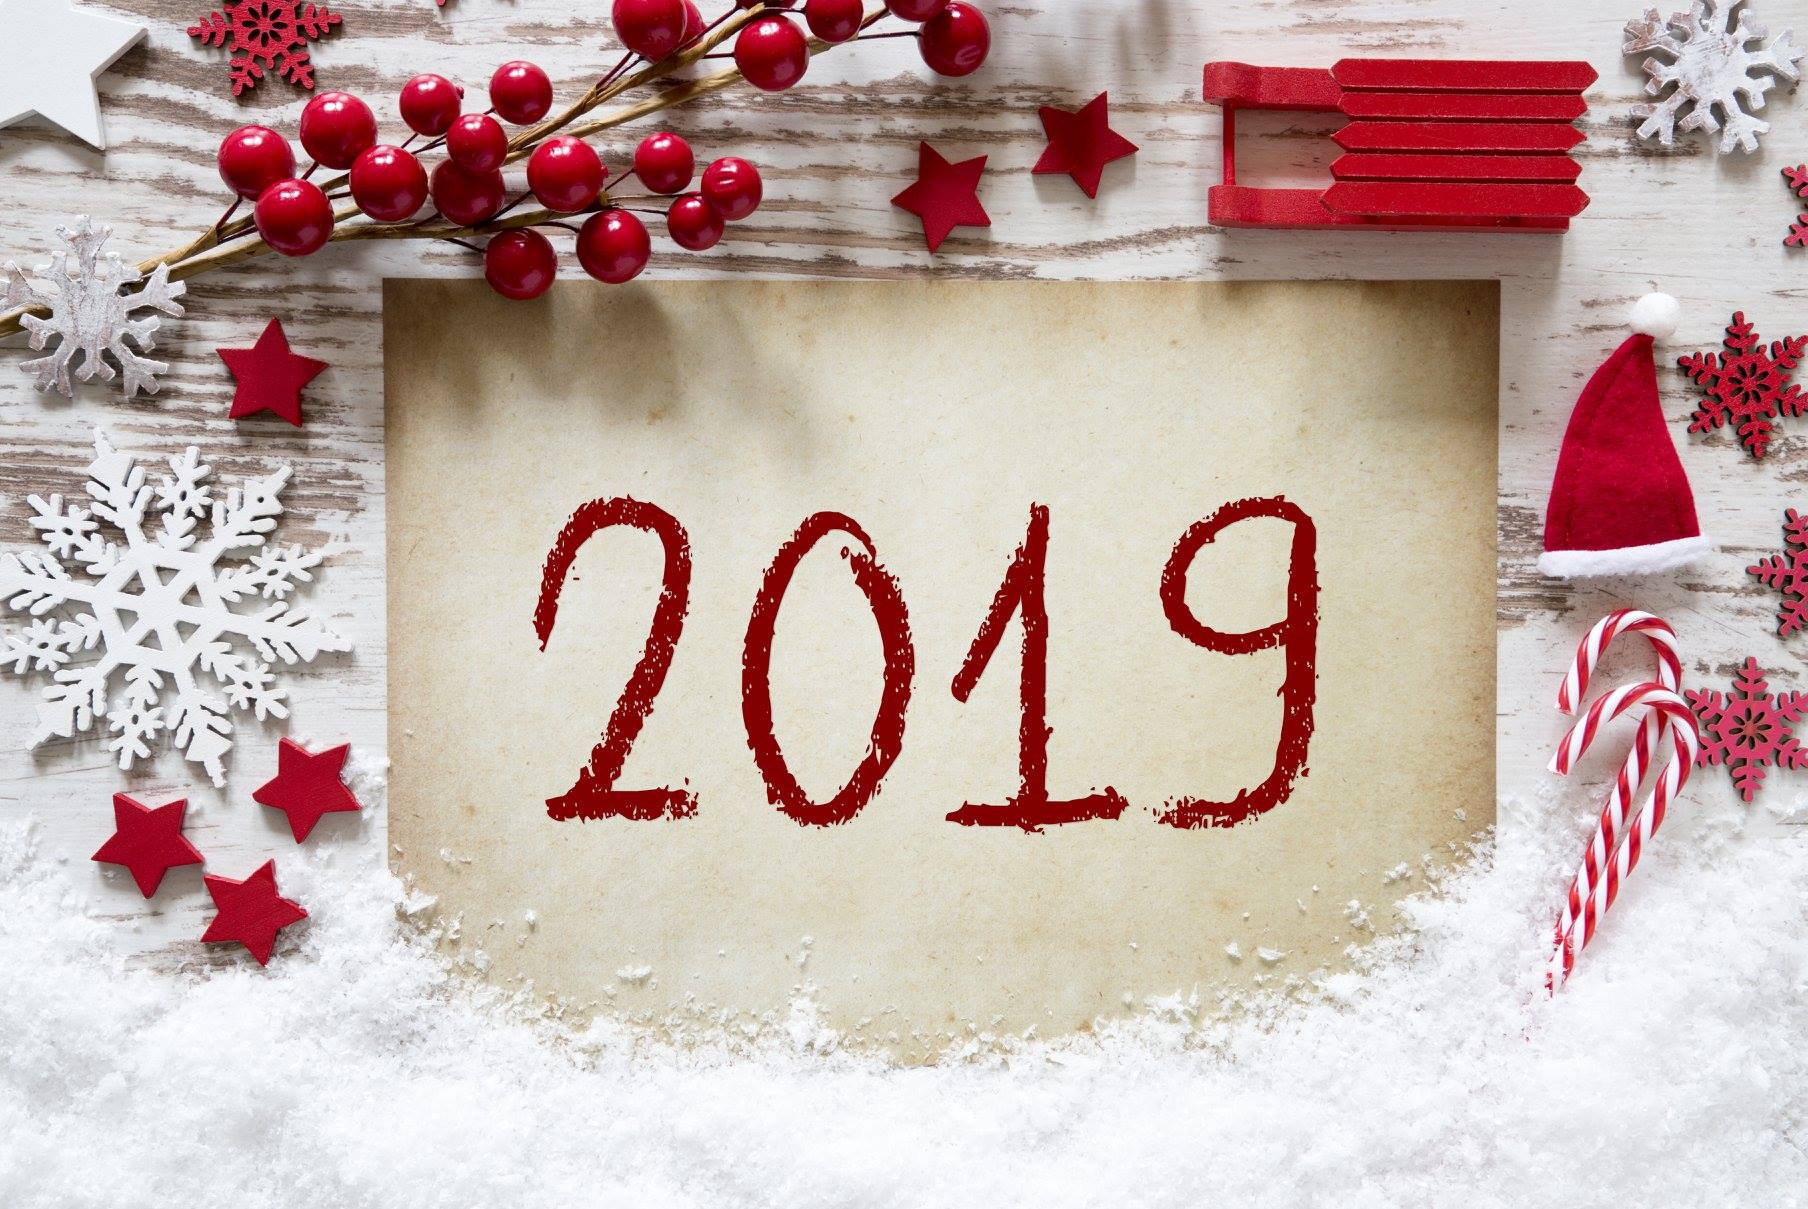 happy new year 2019 3 صور مكتوب عليها العام الجديد 2019